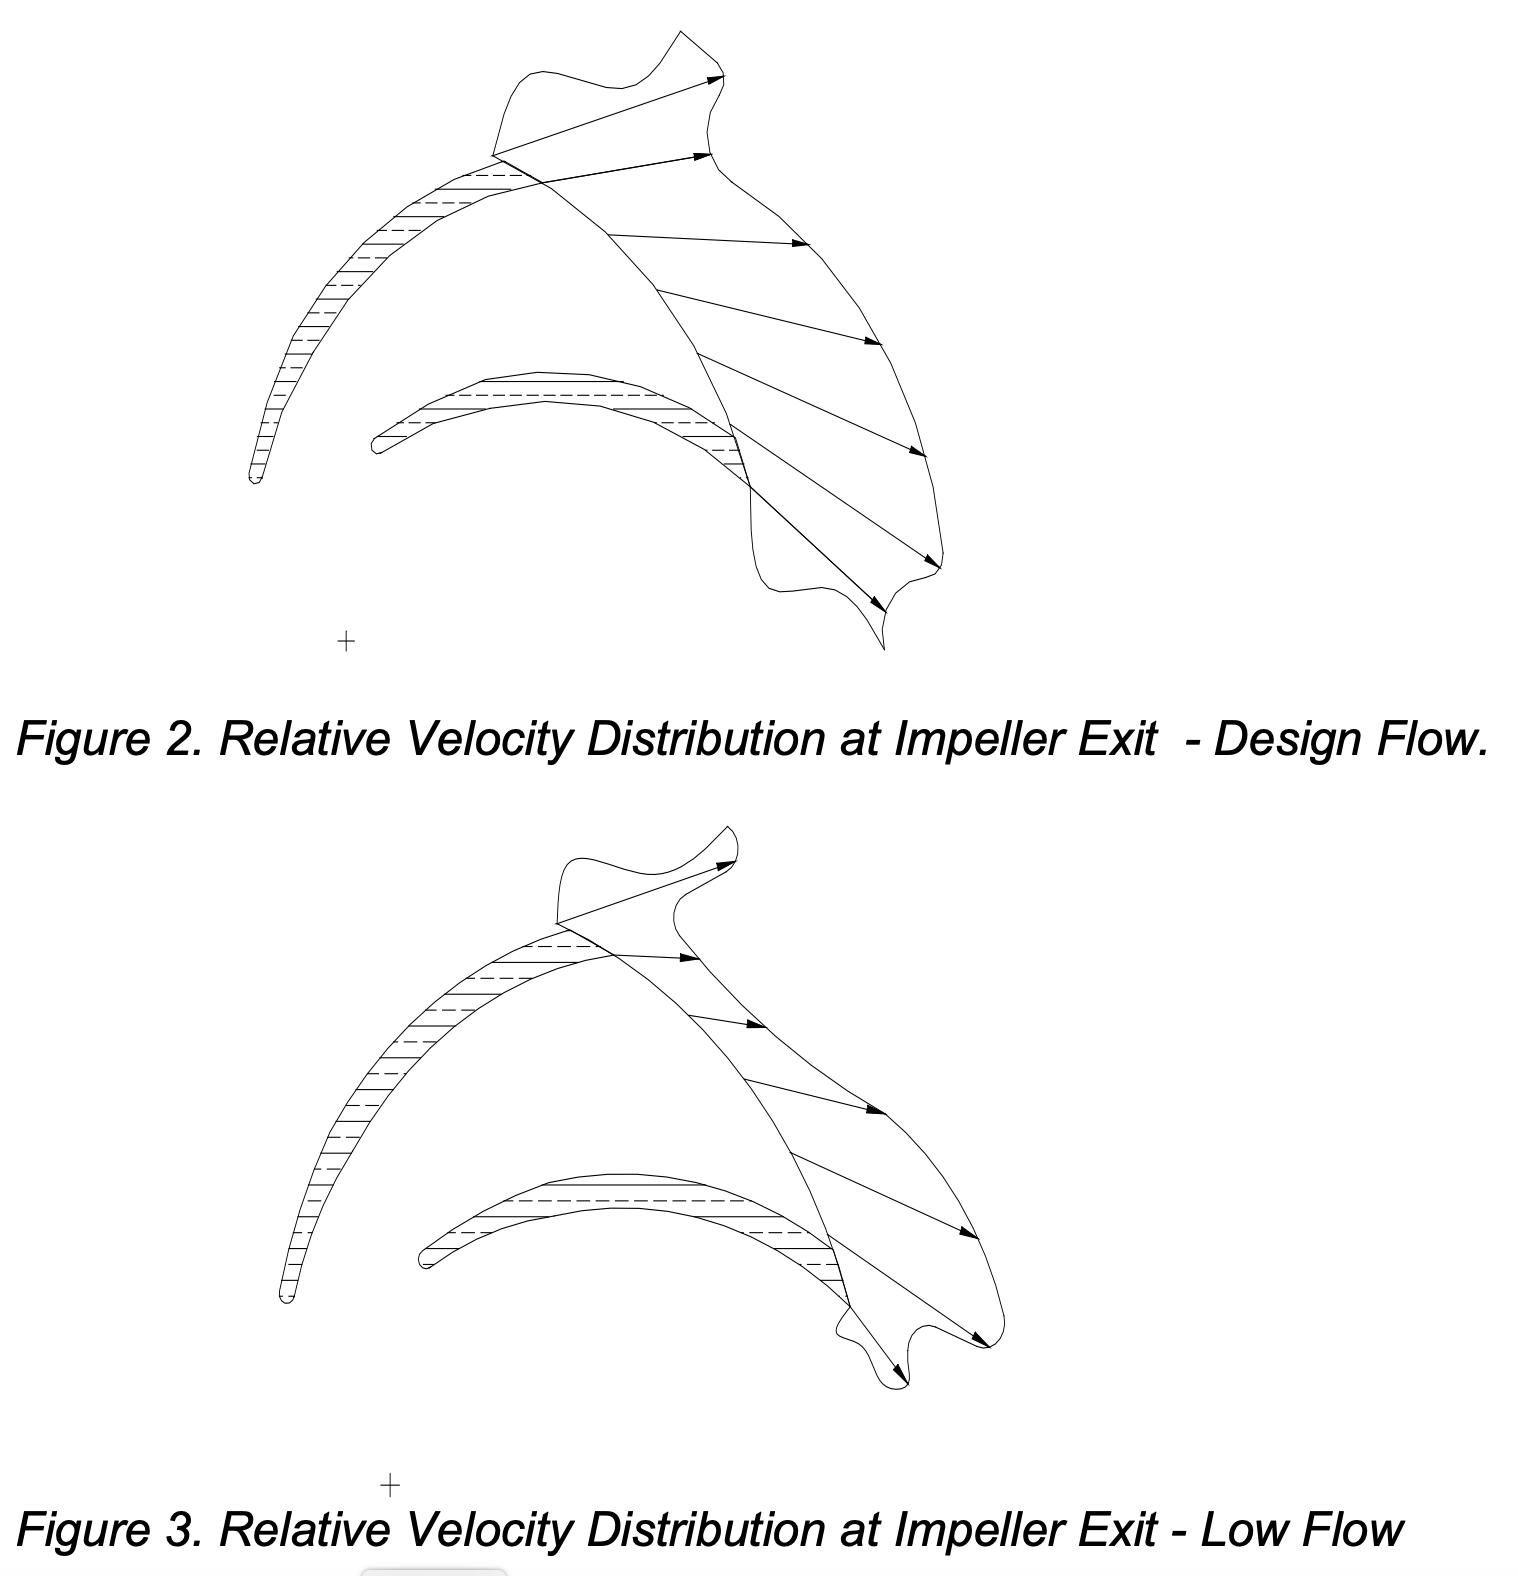 pump impeller design flow